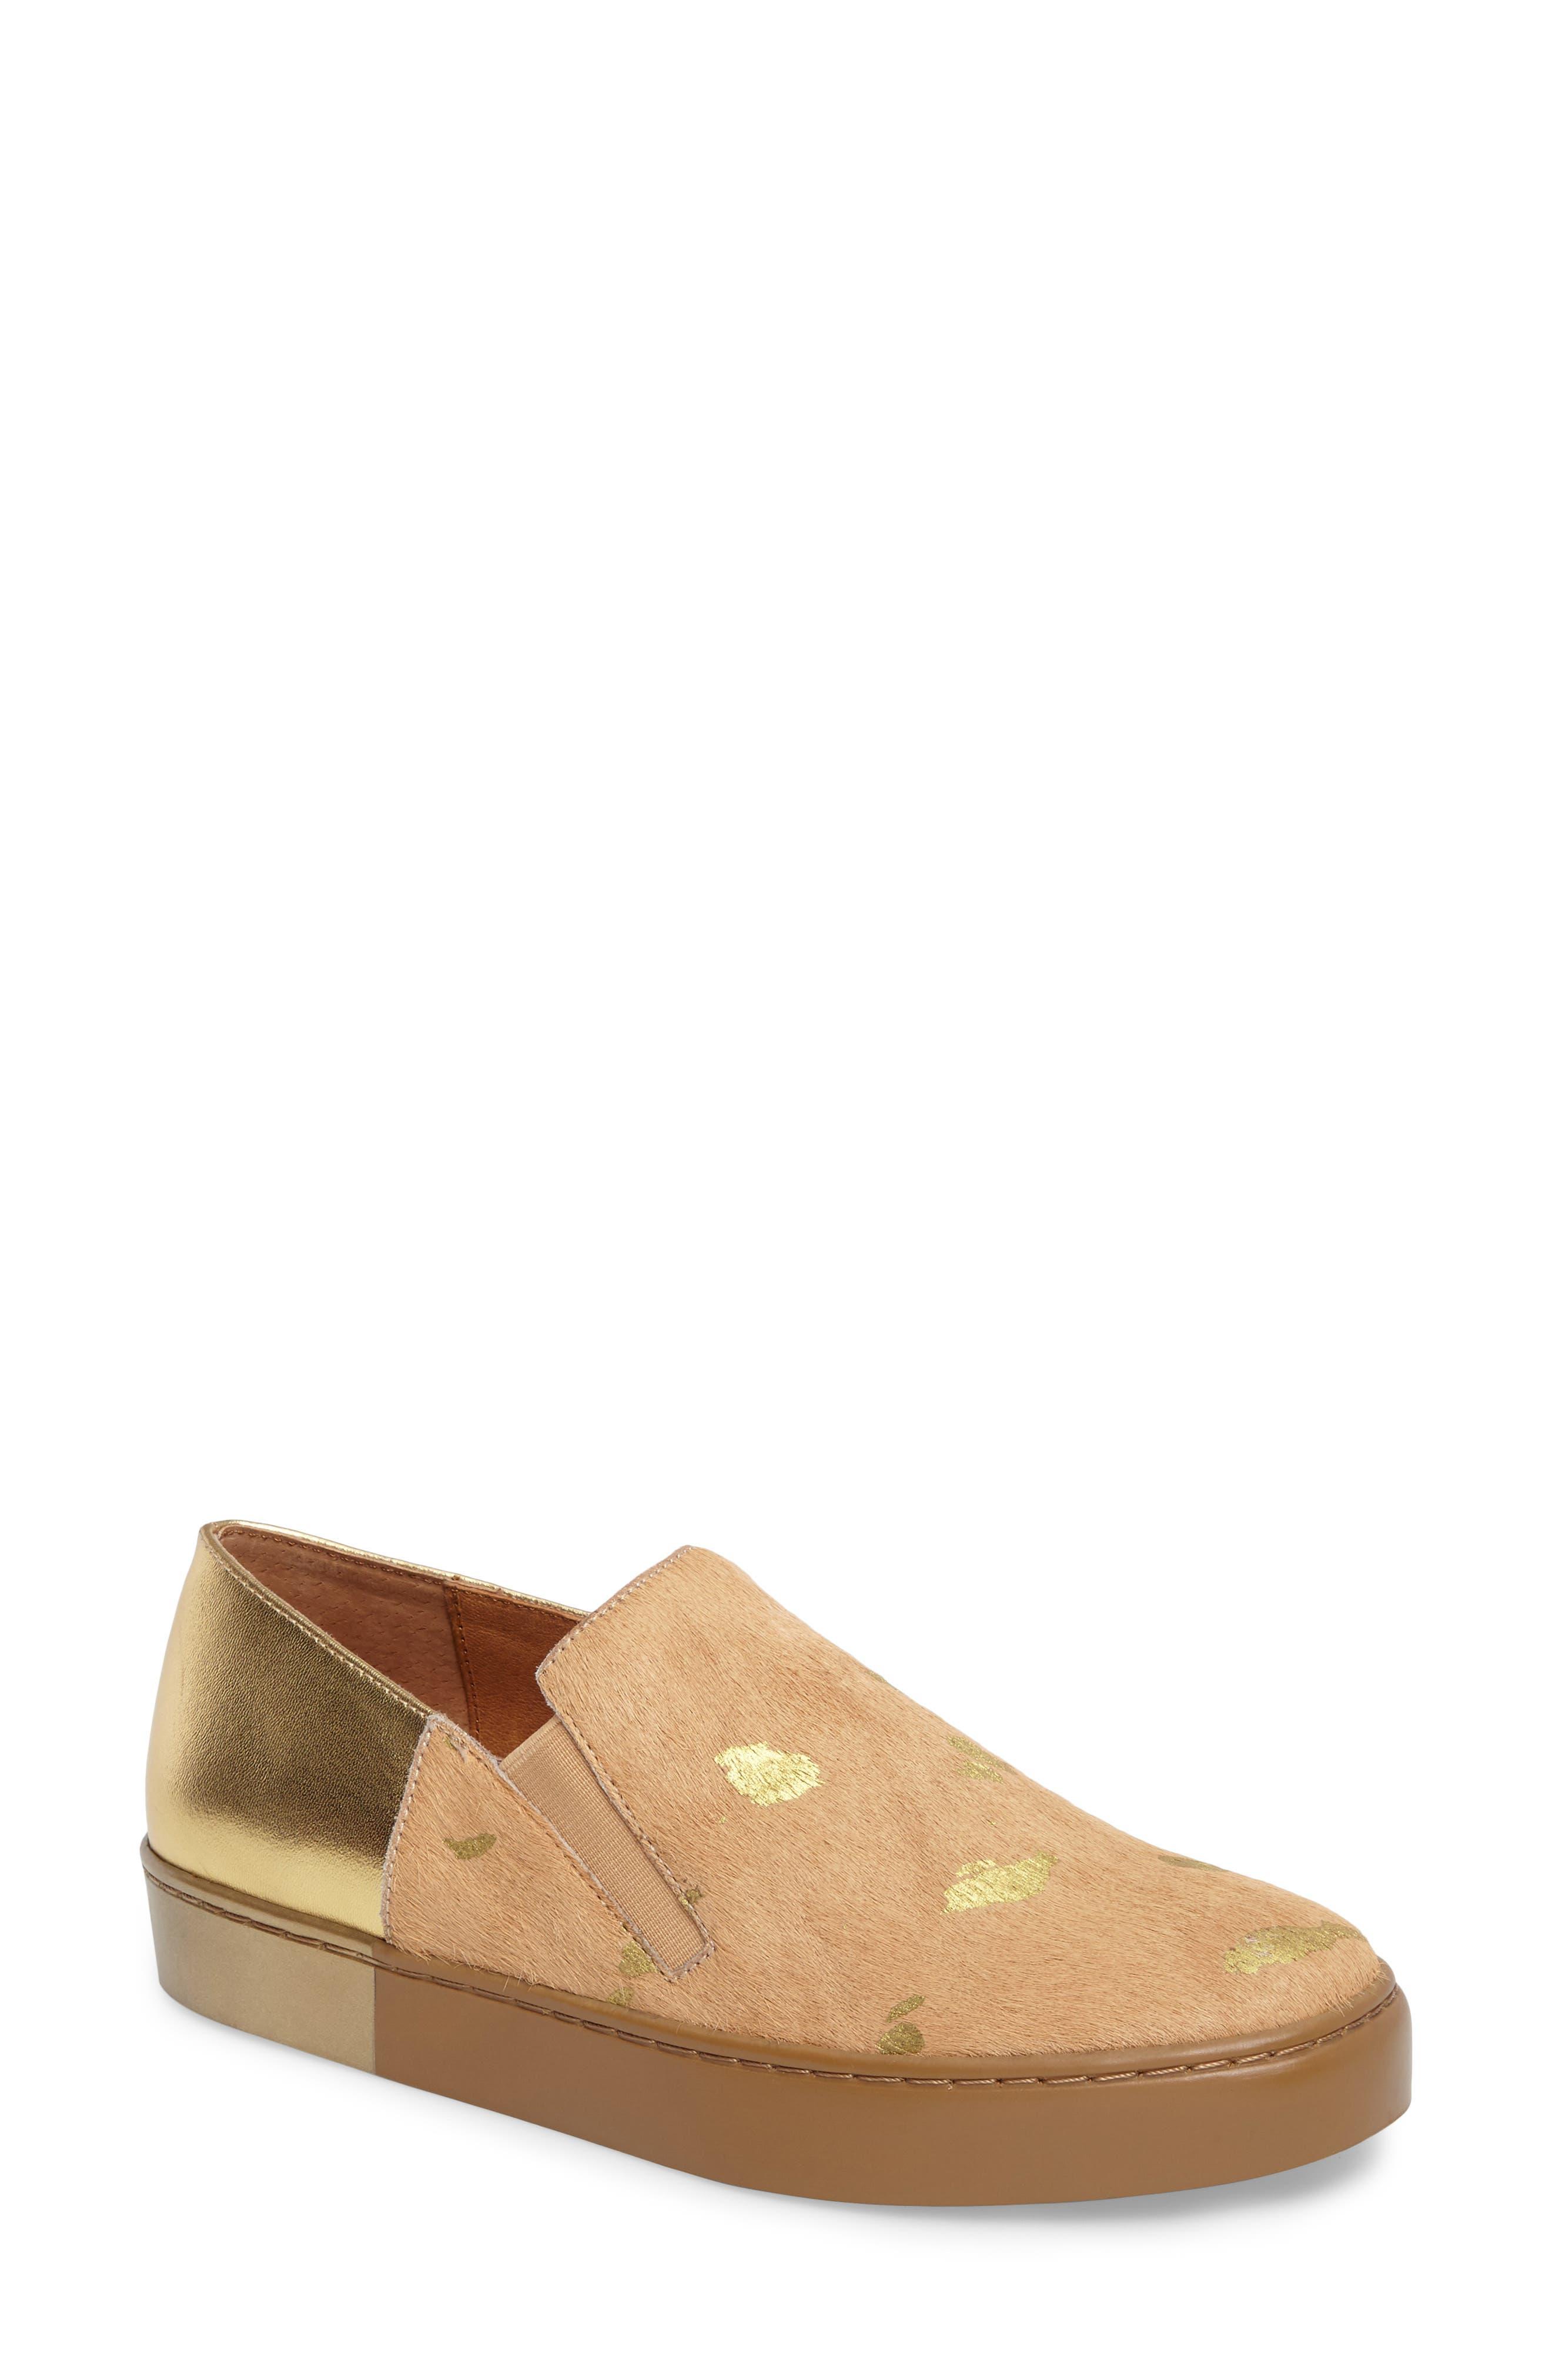 Varsity Slip-On Sneaker,                         Main,                         color, Taupe